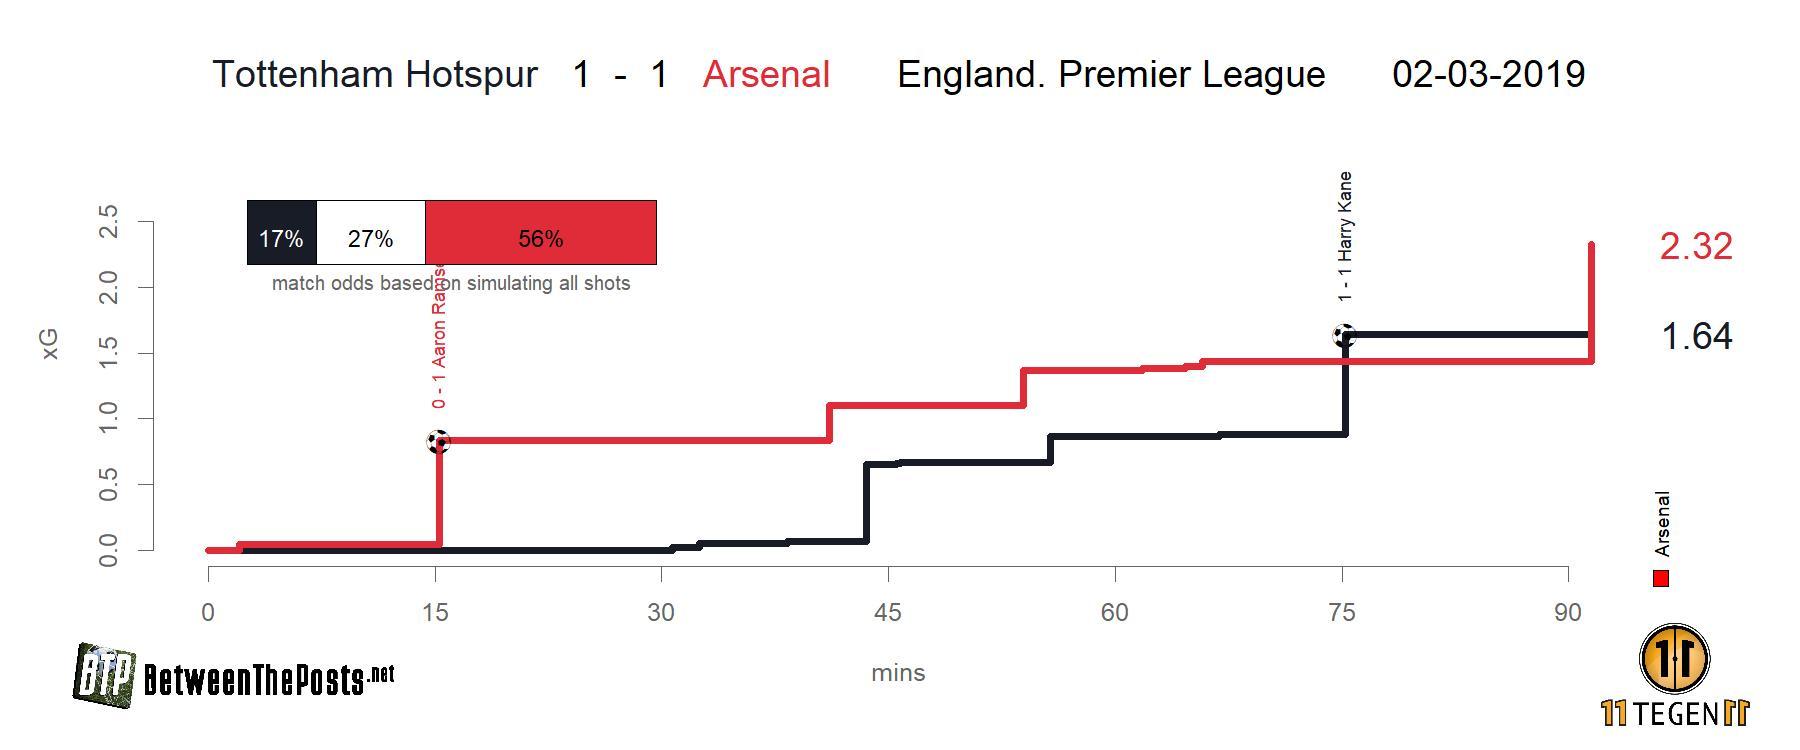 Expected goals plot Tottenham Hotspur - Arsenal 1-1 Premier League